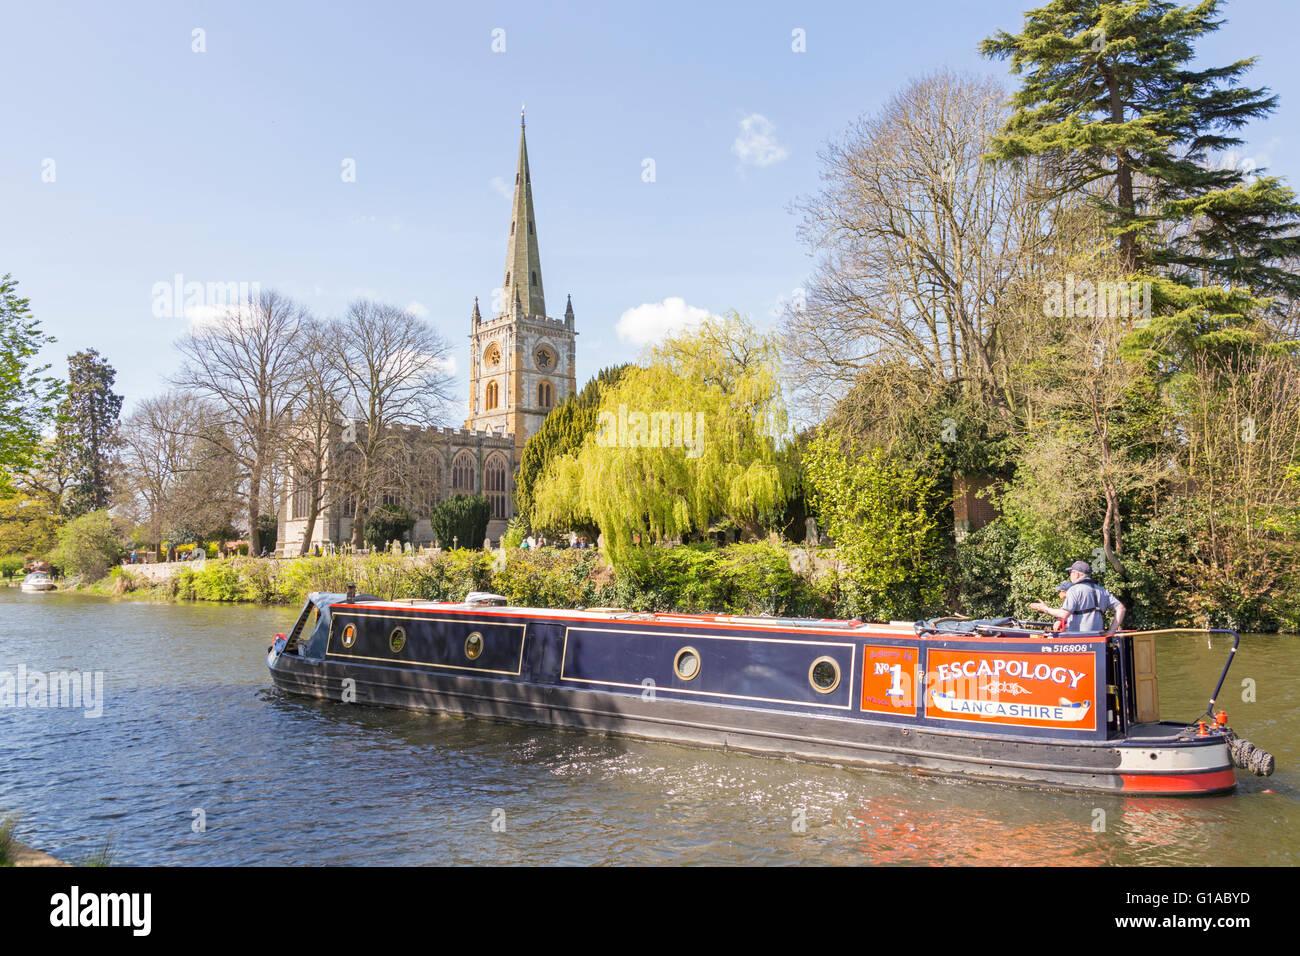 Narrowboat on the River Avon passing Holy Trinity Church at Stratford upon Avon, Warwickshire, England, UK - Stock Image